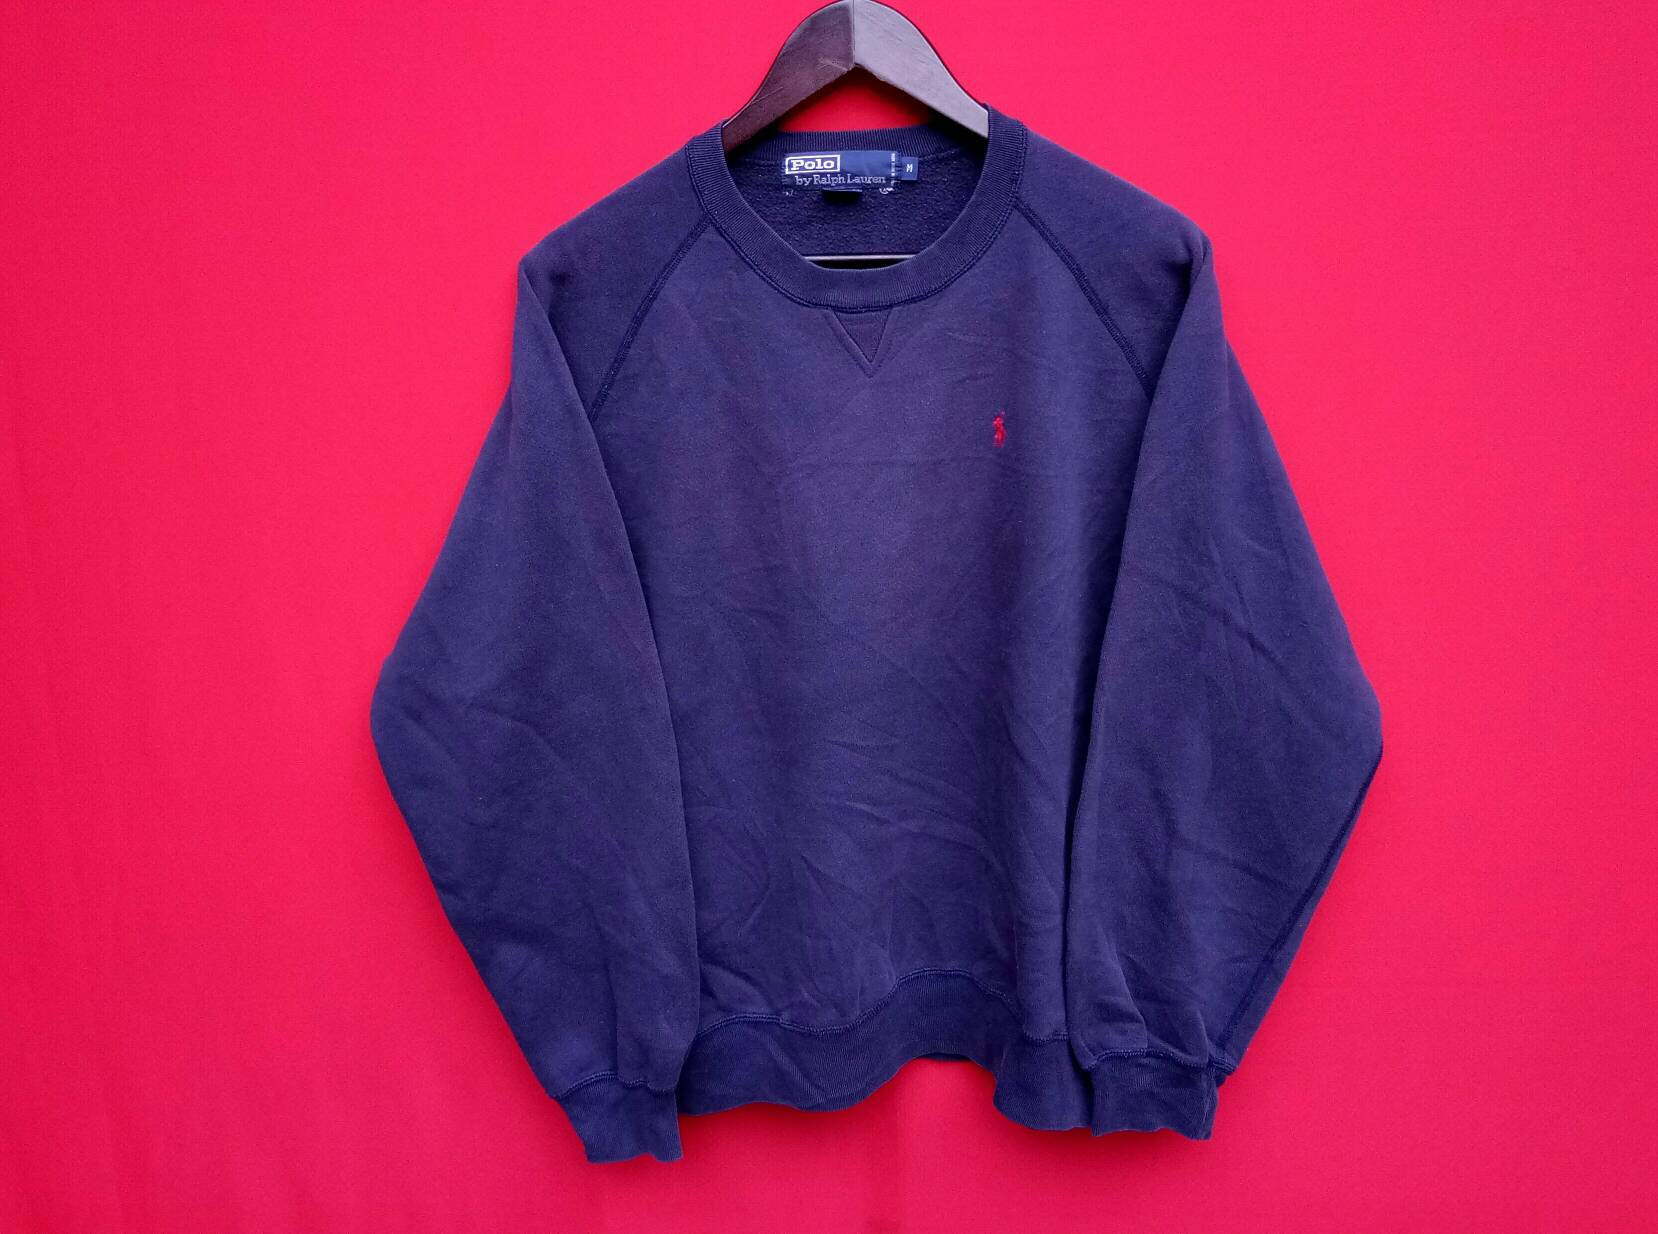 fbb62e166 ... zip hoodie originally for depop 8fad0 8eb32  sale vintage ralph lauren  sweatshirt medium mens size etsy d7ad4 74db0